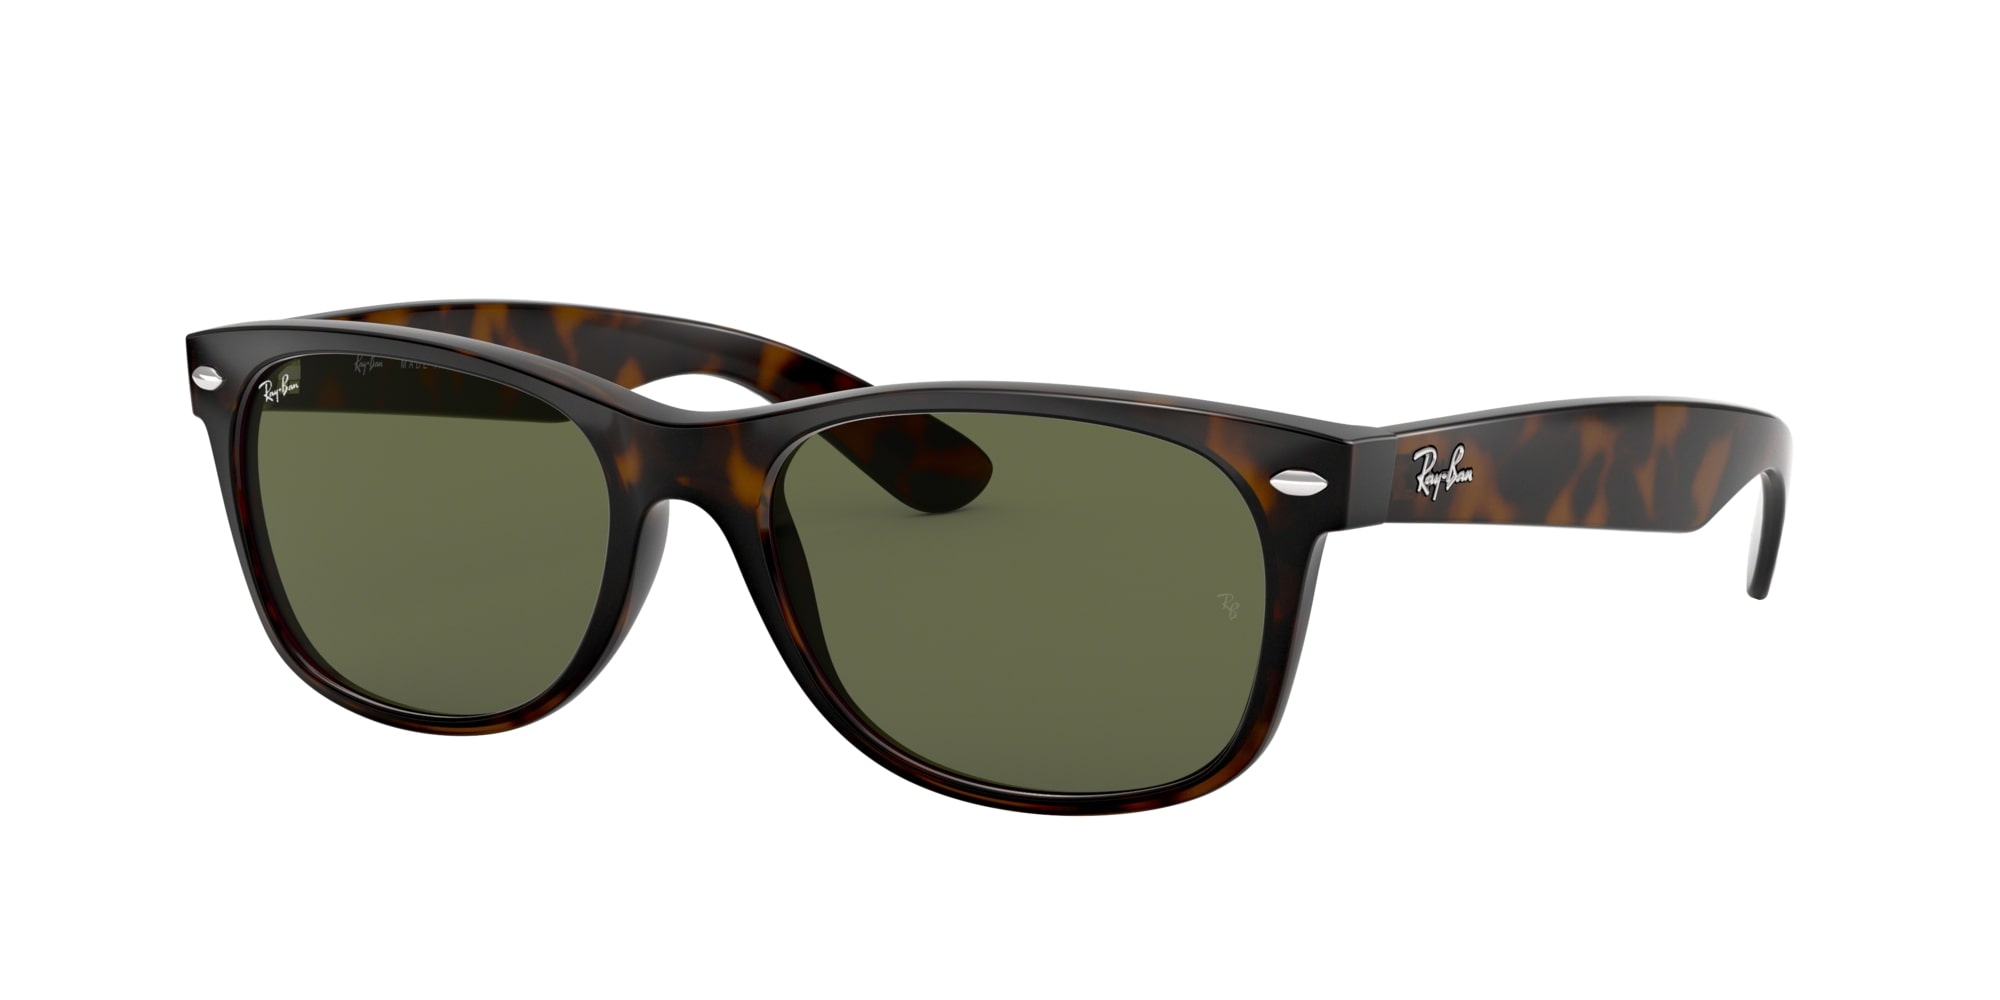 Ray Ban New Wayfarer Classic solbriller